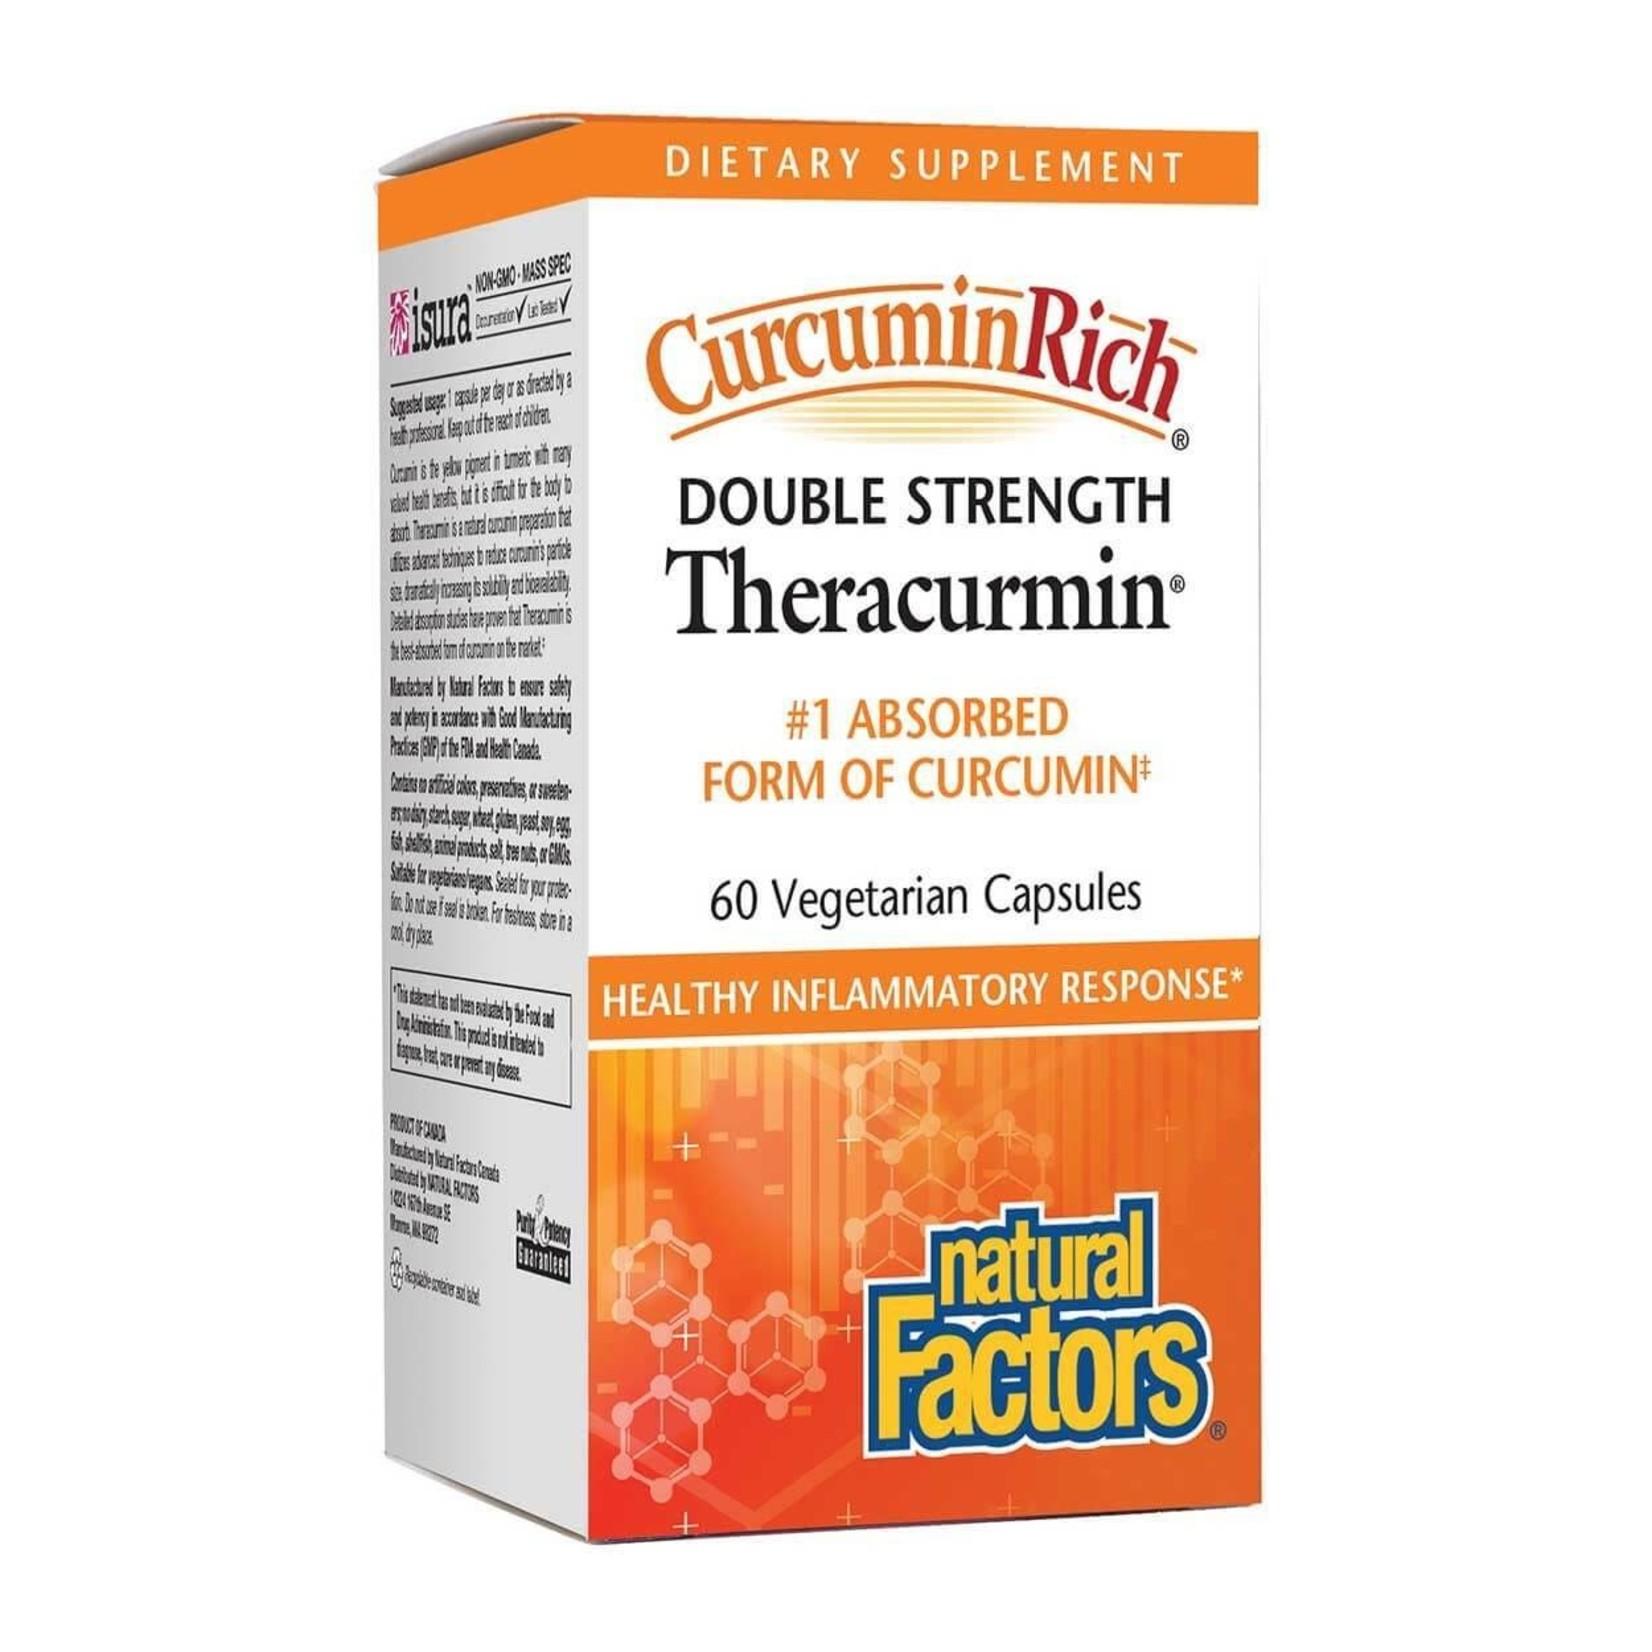 Natural Factors Natural Factors Double Strength Theracurmin 60 caps